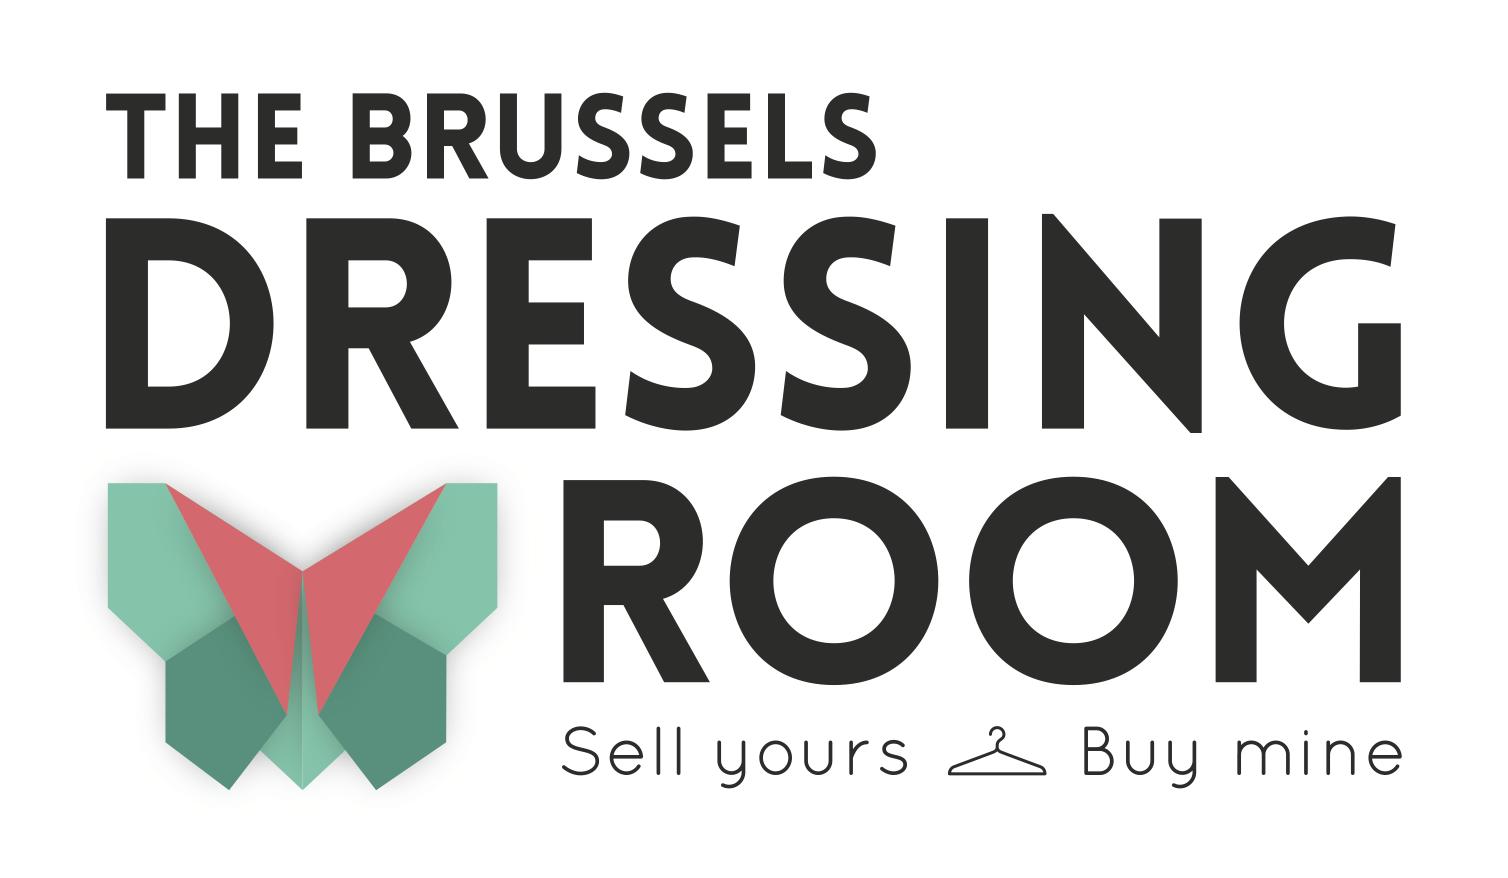 Brussels dressing room